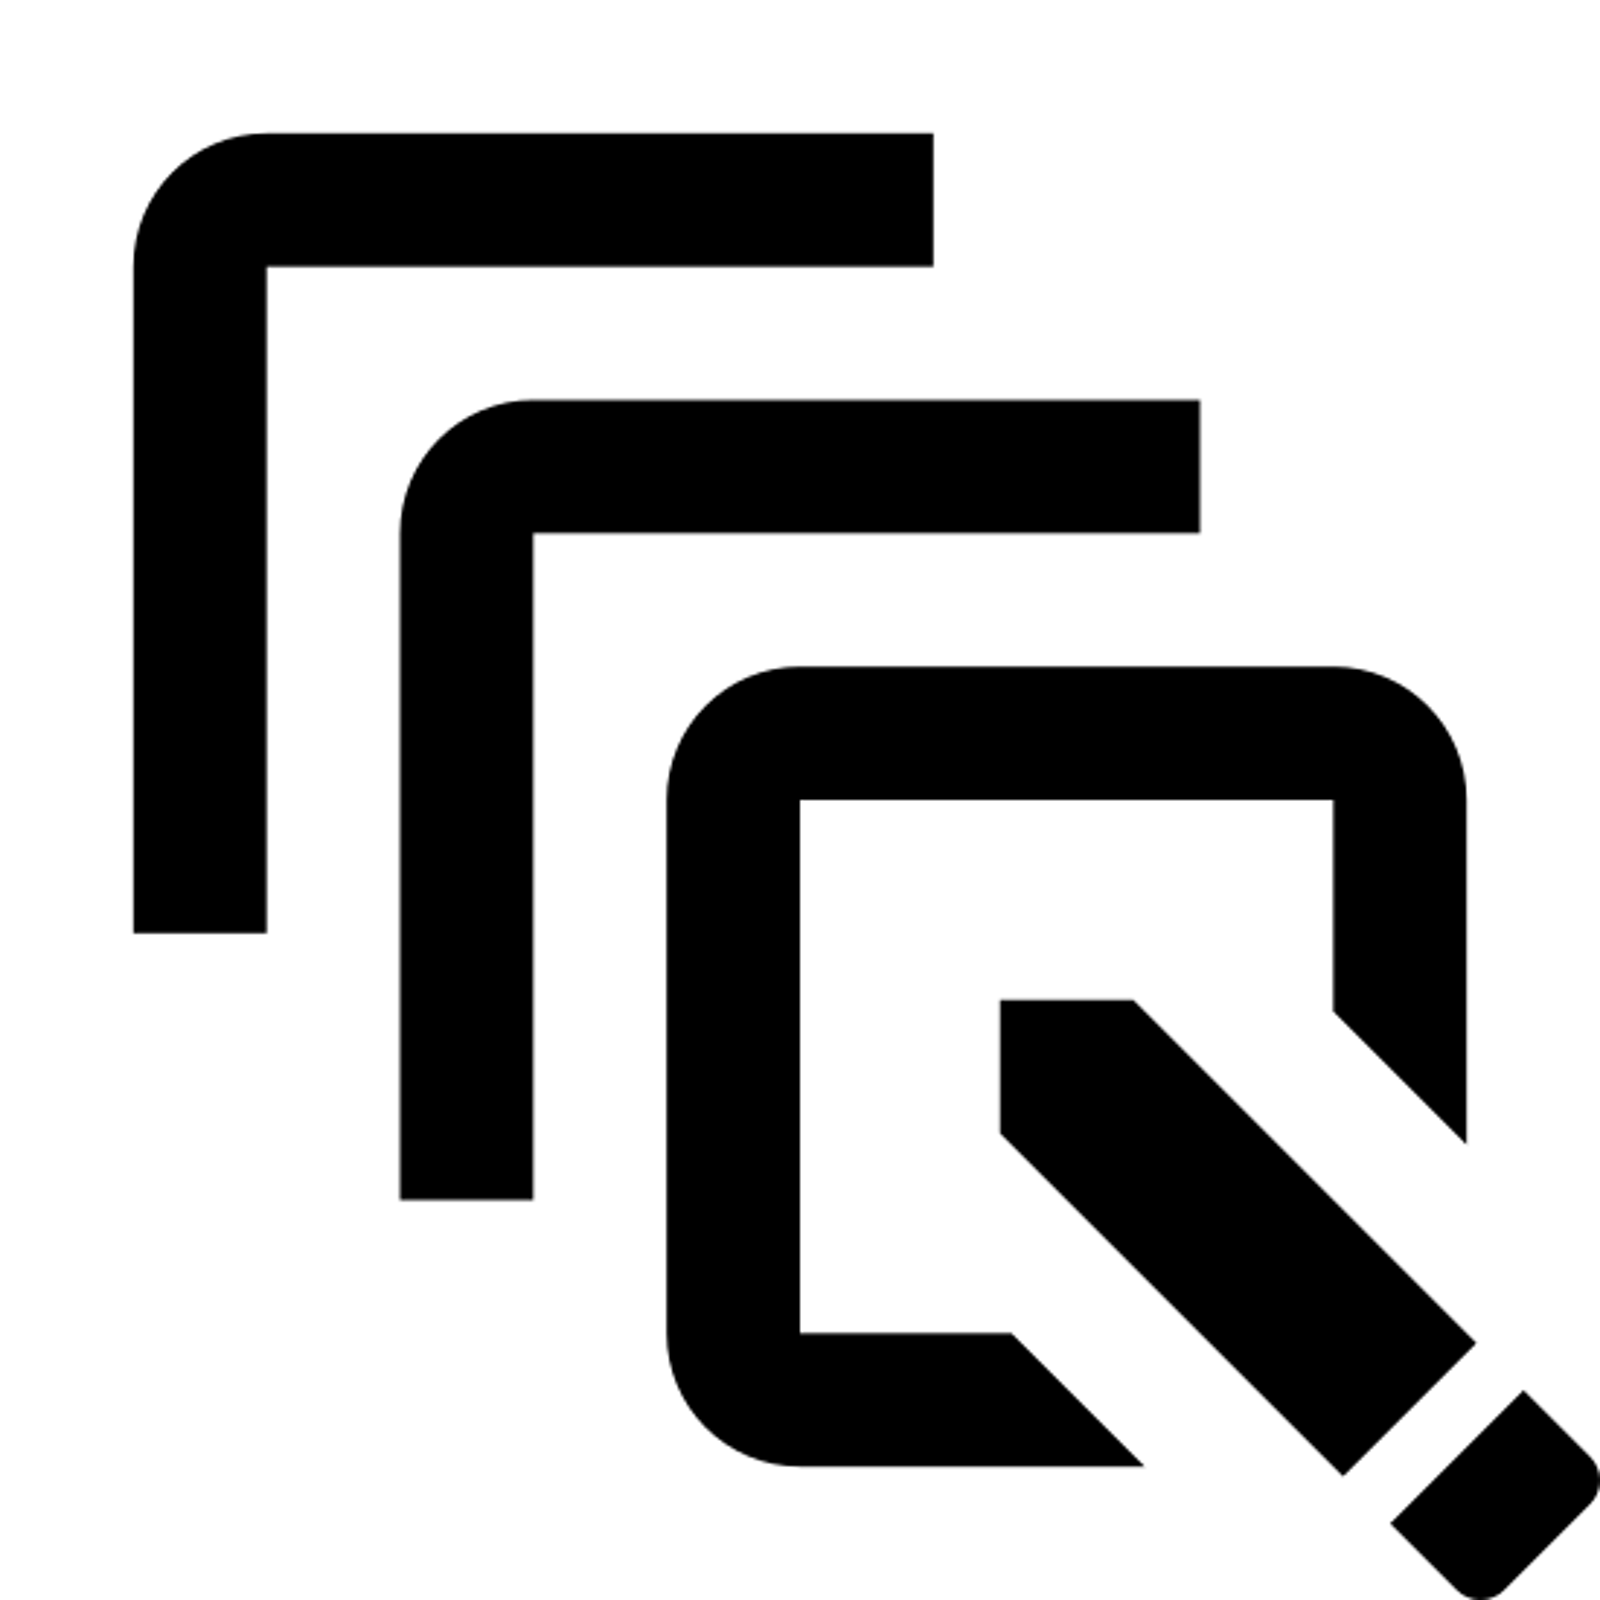 多重编辑 icon